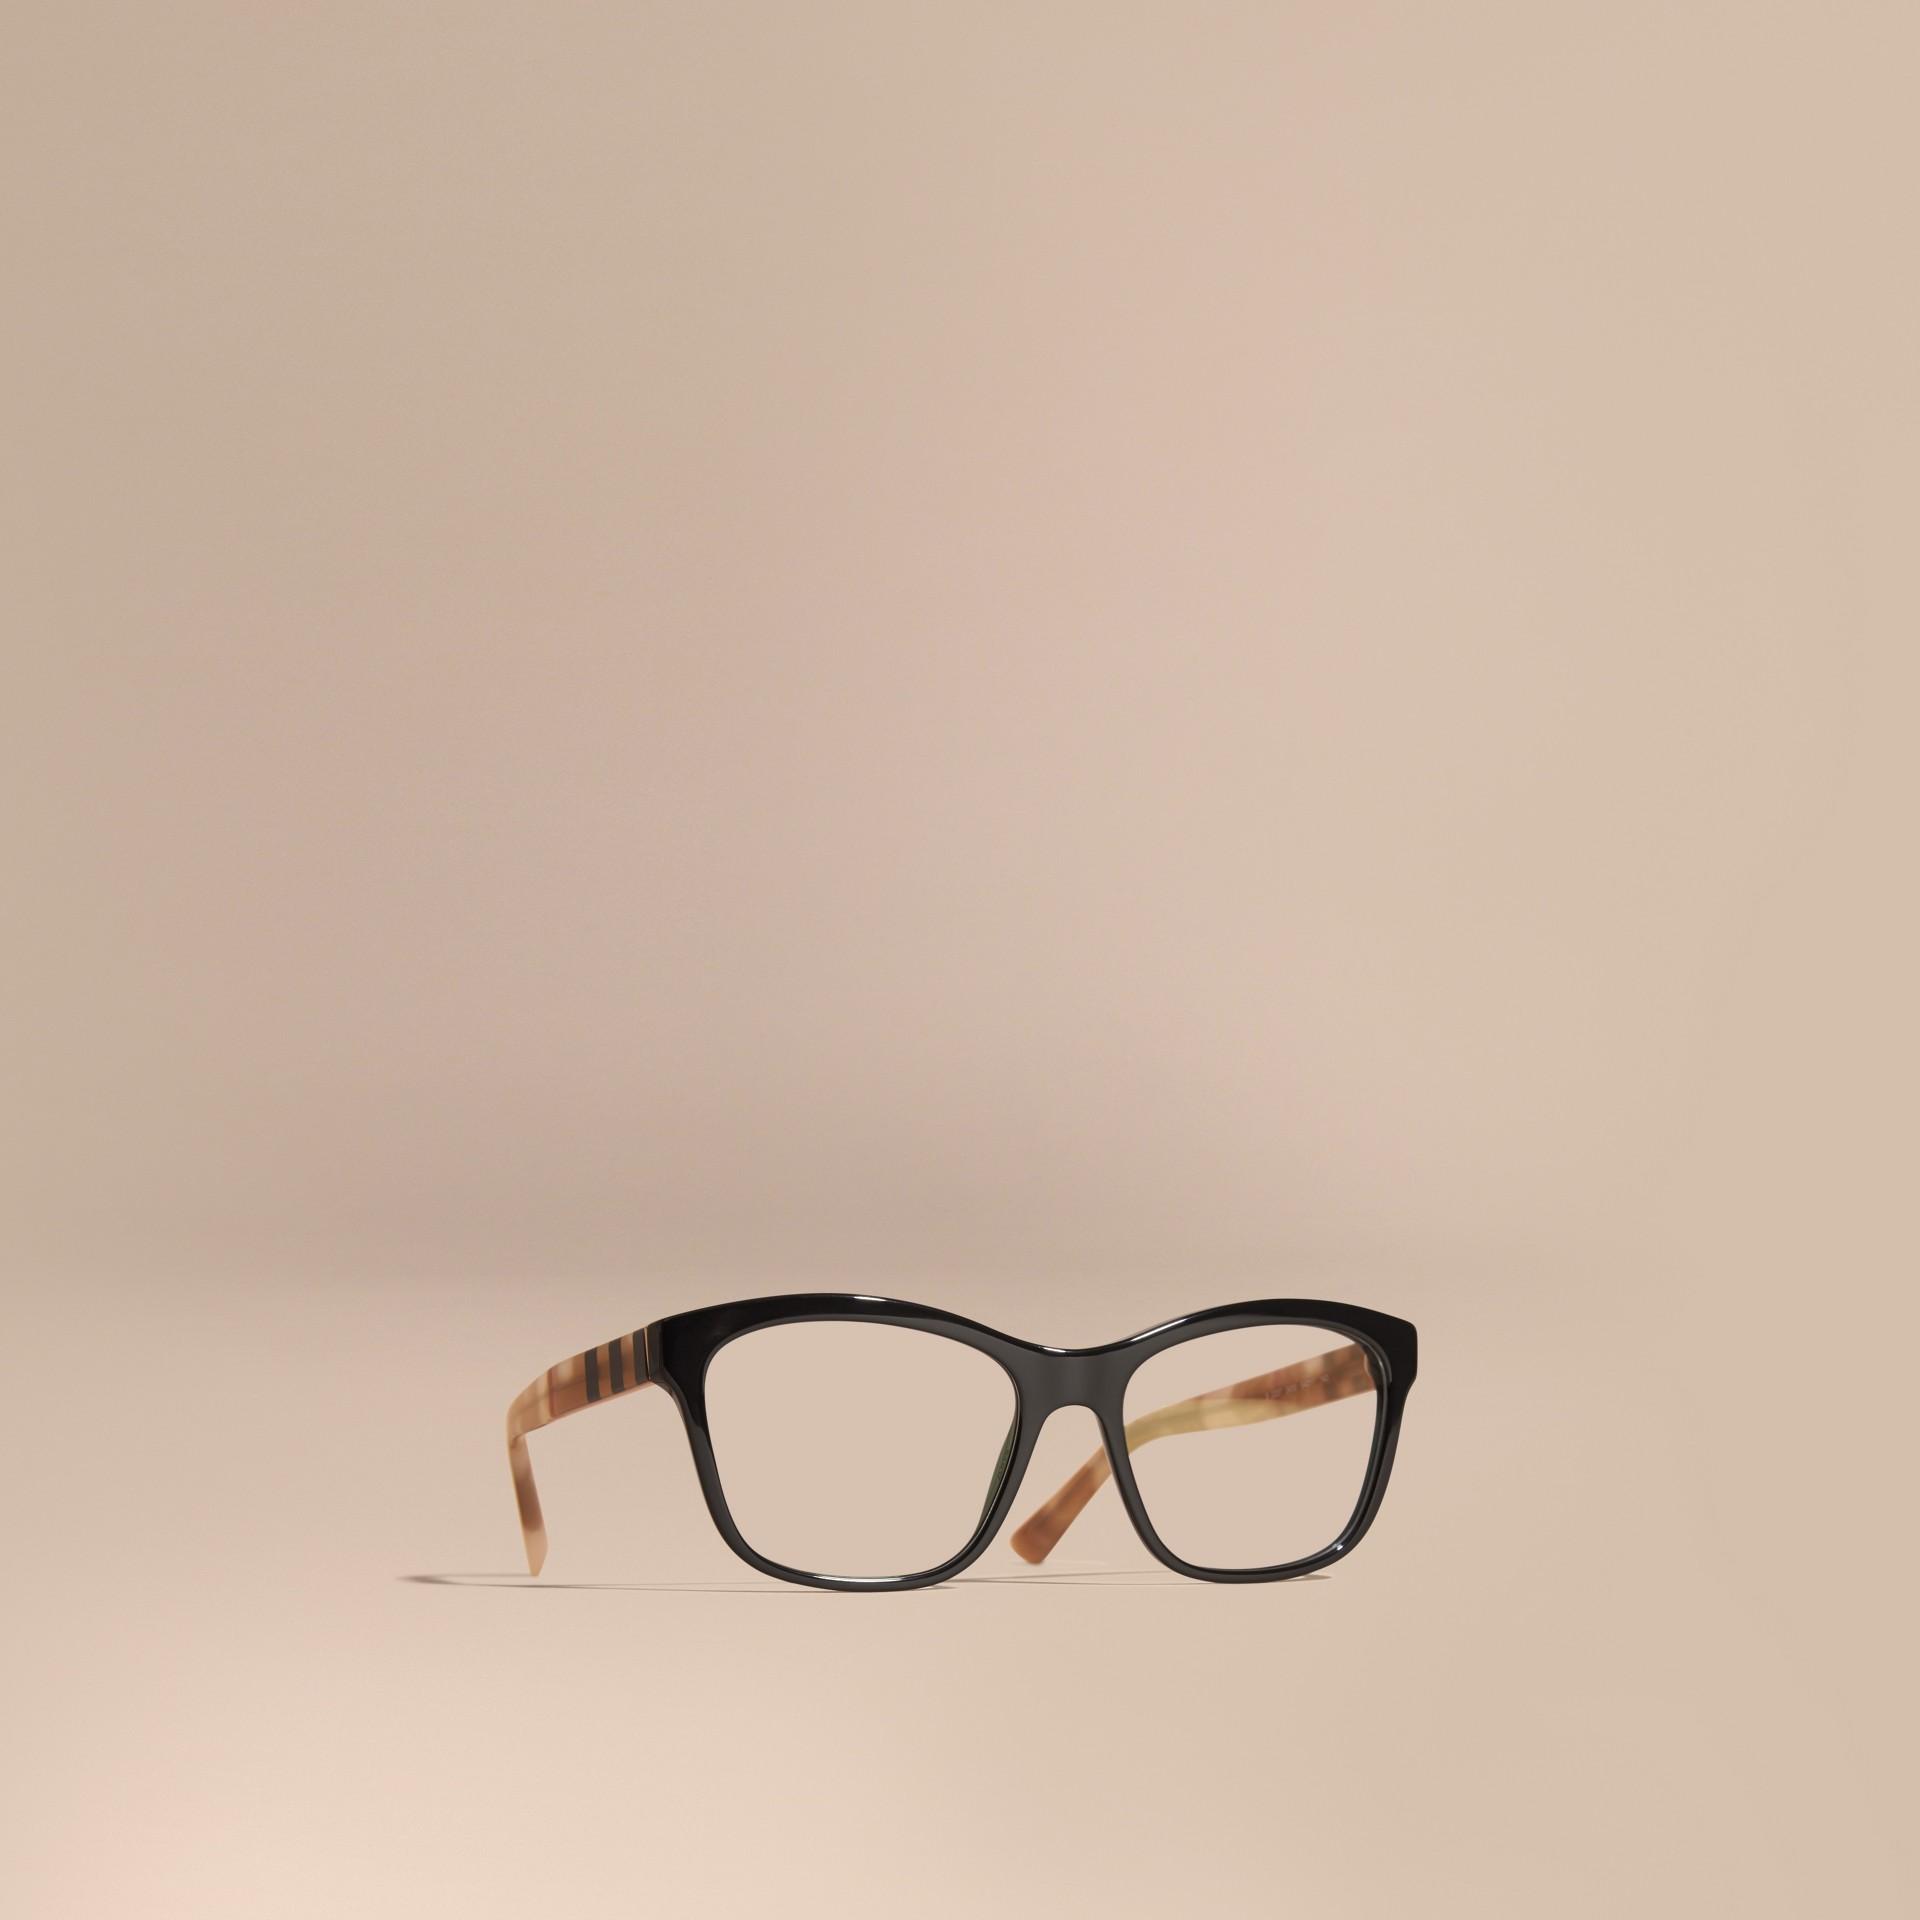 Black Check Detail Square Optical Frames Black - gallery image 1